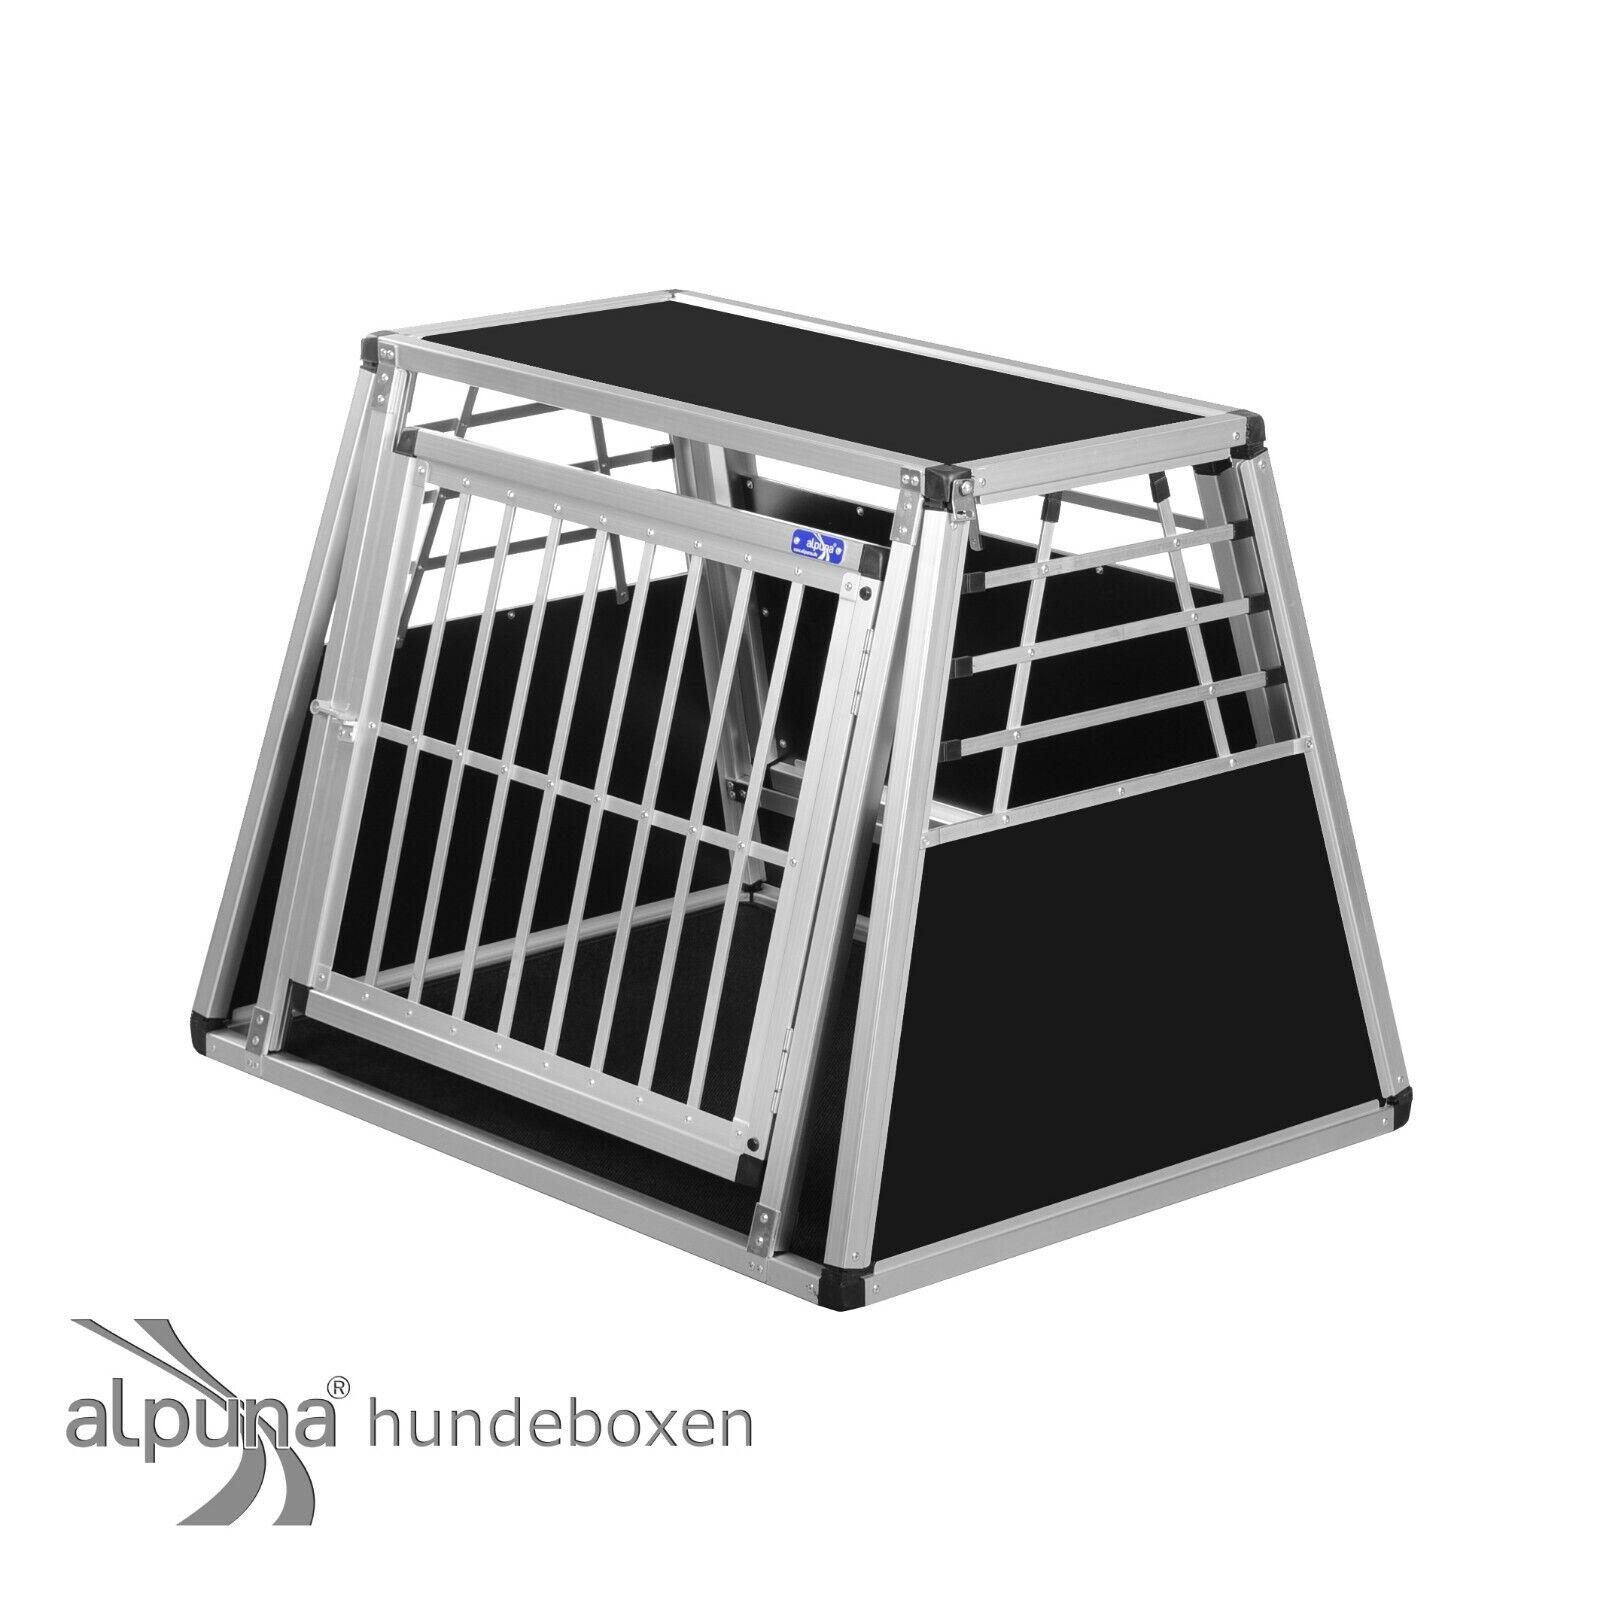 N11 Hundetransportbox Gitterbox Aluminium Transportbox Hundebox Alubox Autobox